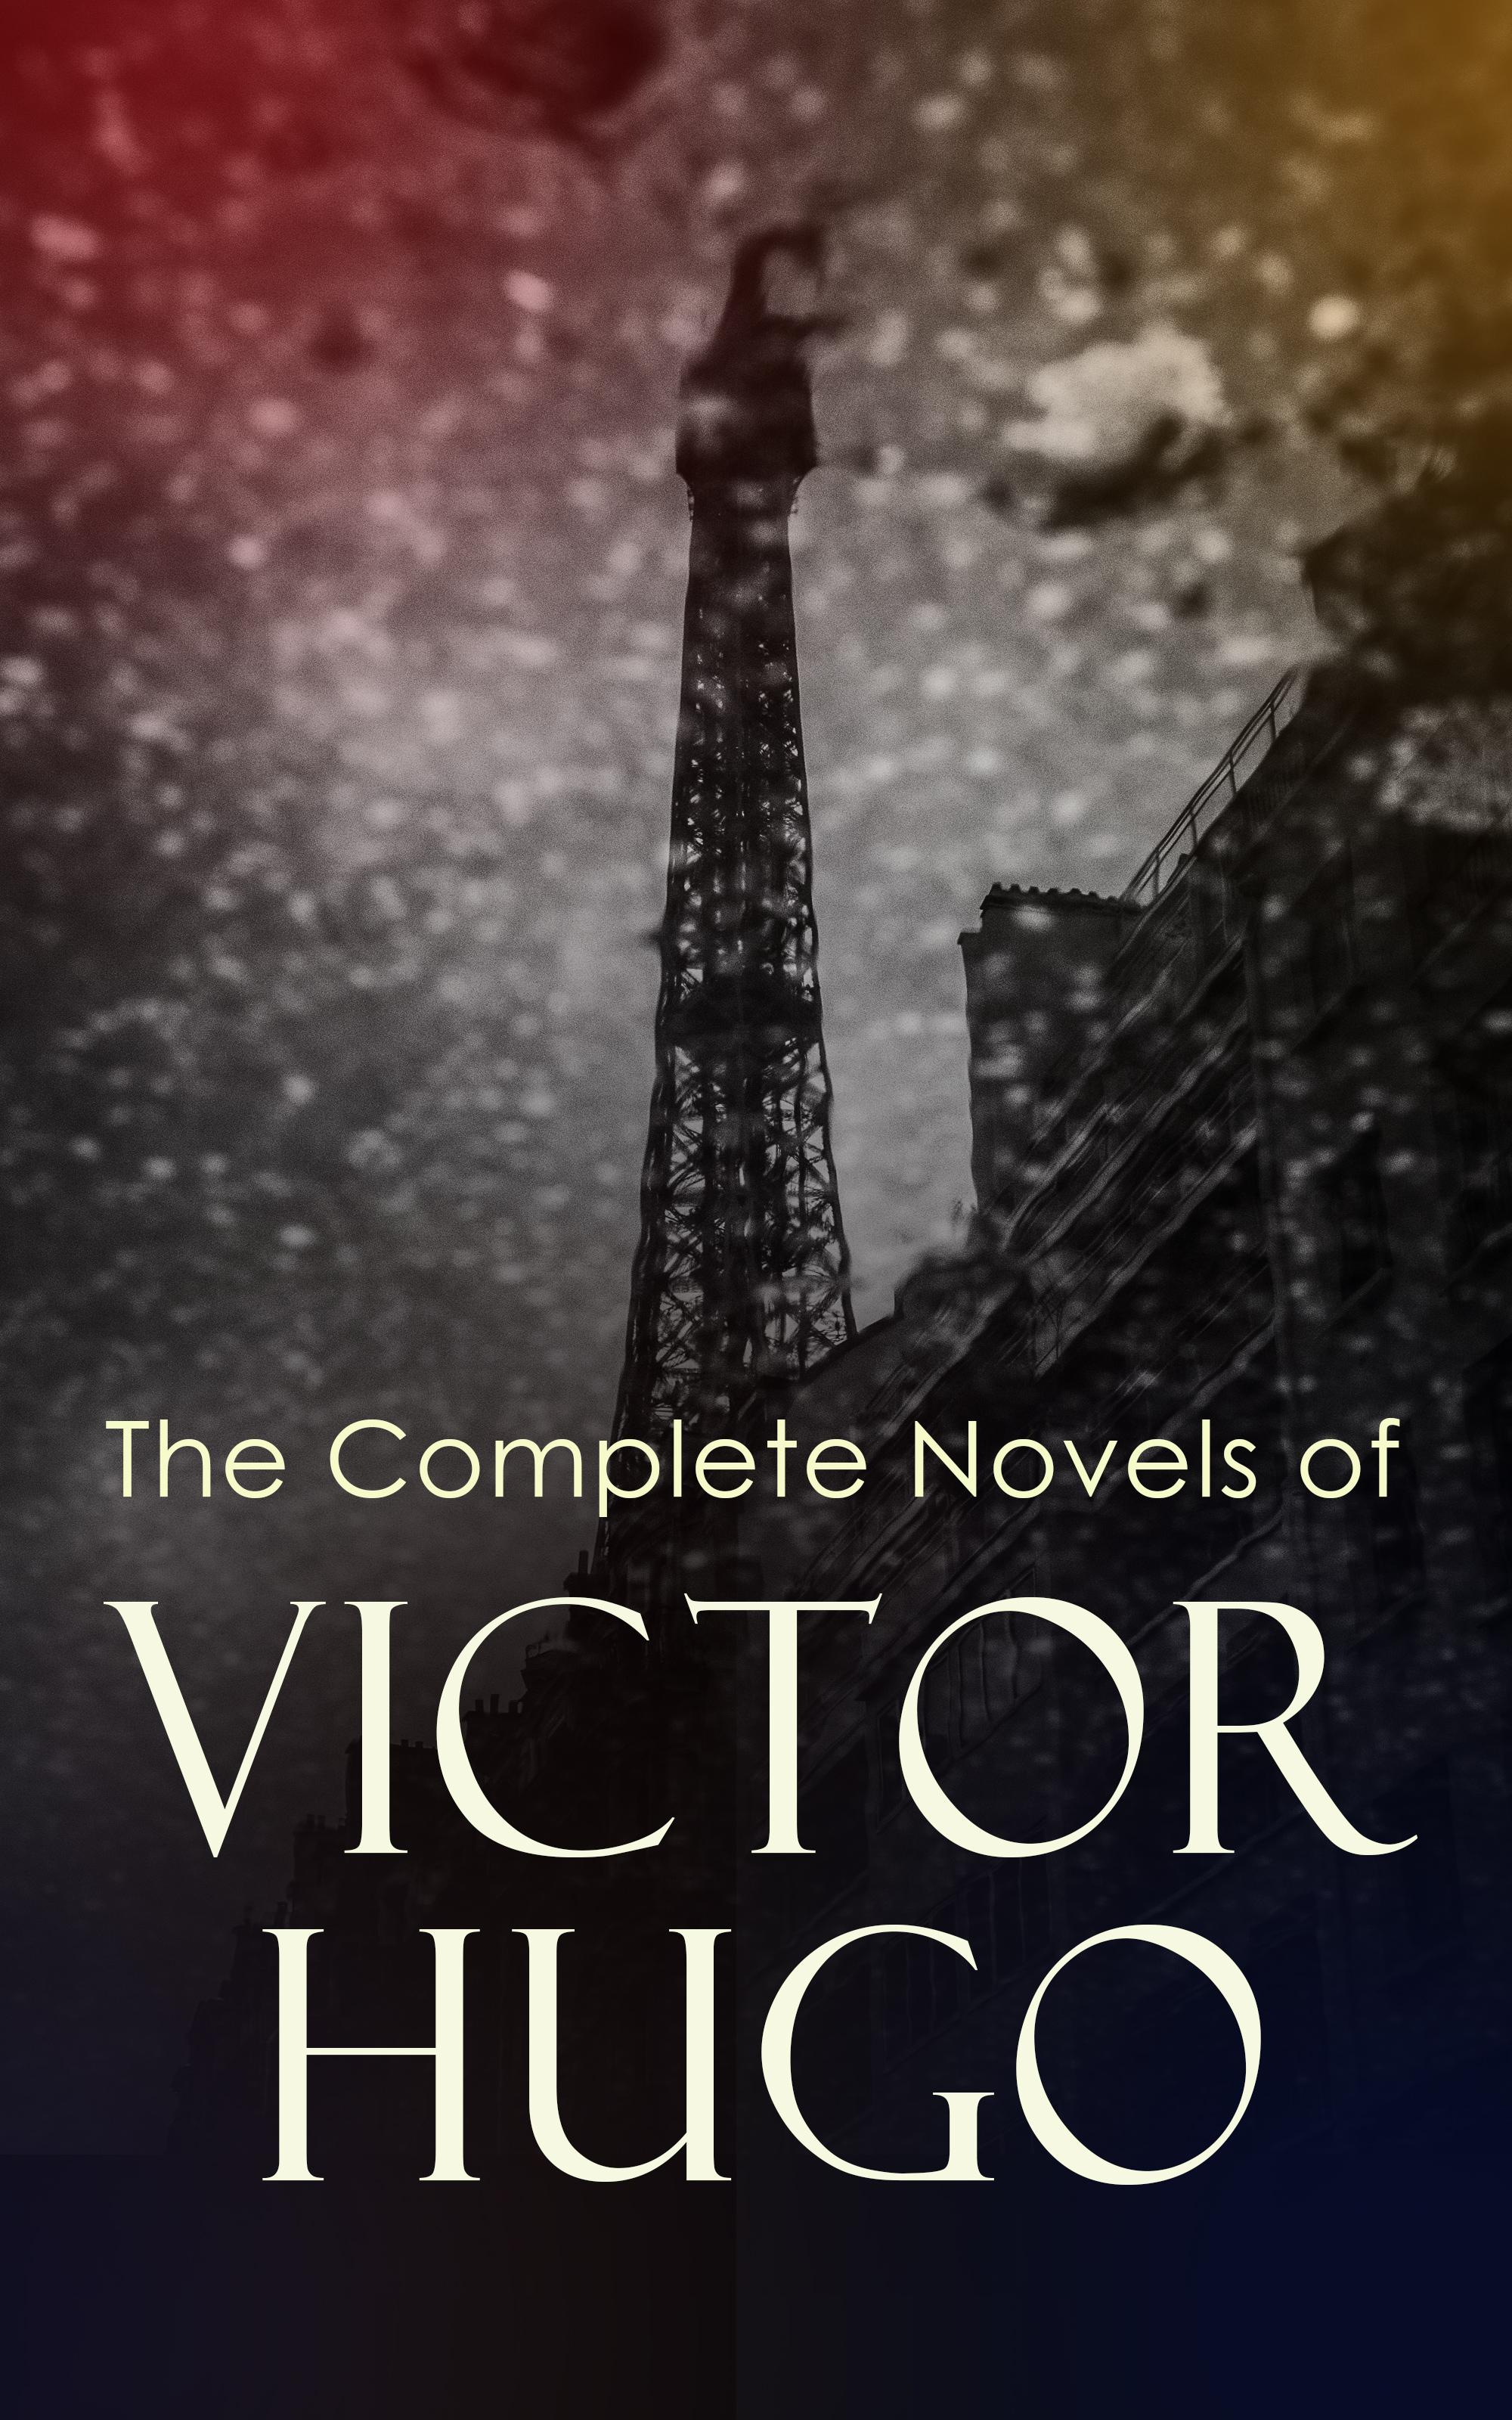 Виктор Мари Гюго The Complete Novels of Victor Hugo